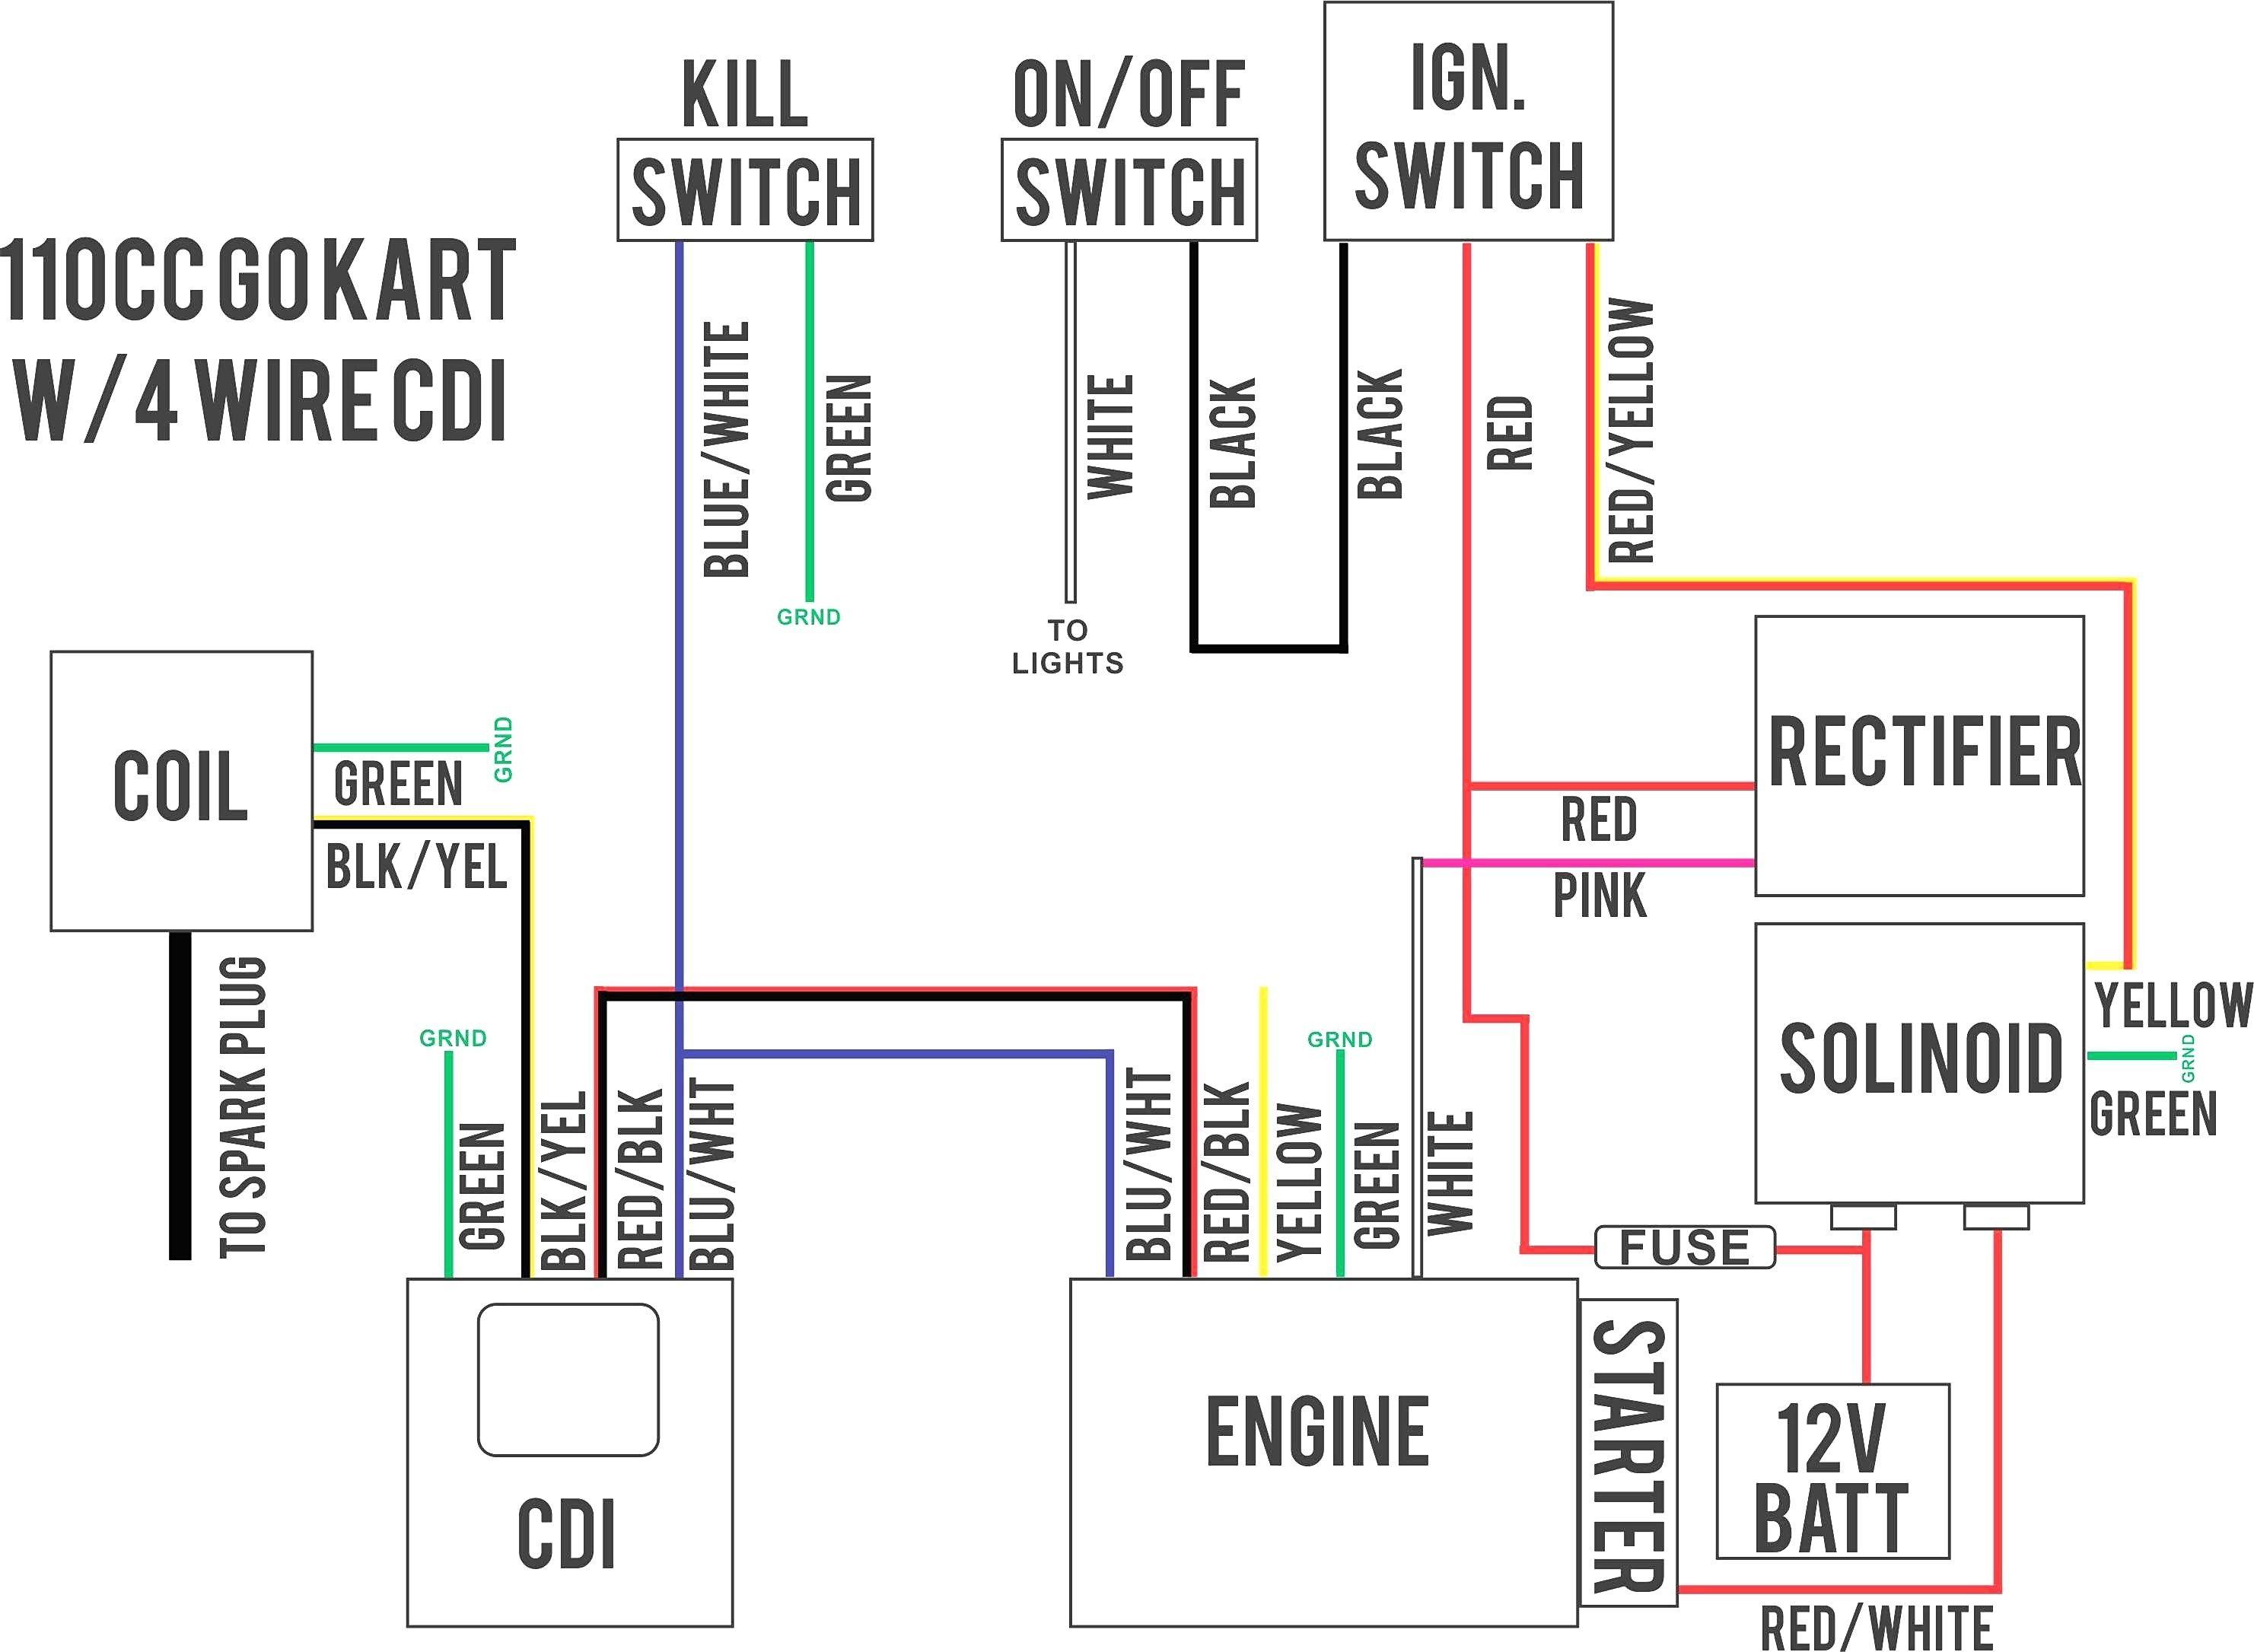 Electrical Wiring Diagram Of Motorcycle Http Bookingritzcarlton Info Electrical Wiring Diagra Electrical Wiring Diagram Motorcycle Wiring Electrical Diagram